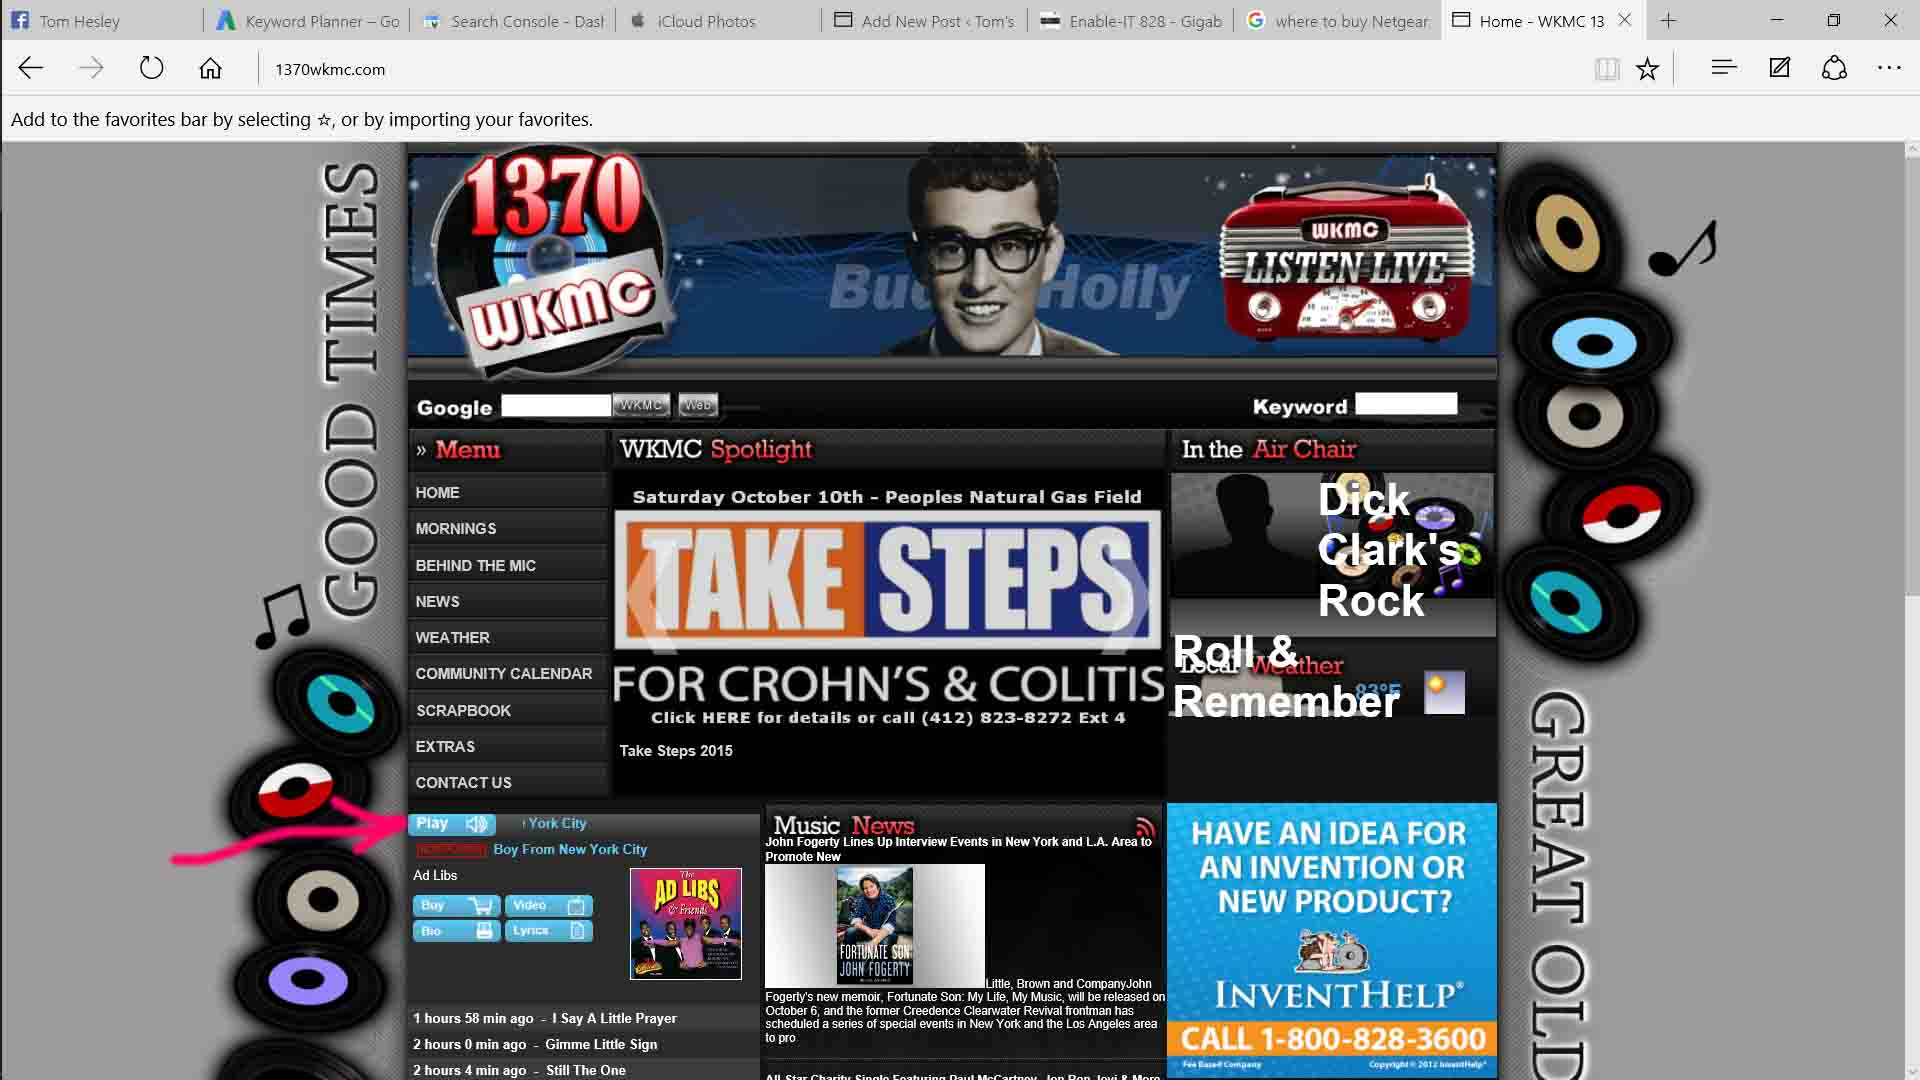 Finding Radio Stream URL Using URL Snooper 2   Tom's Tek Stop